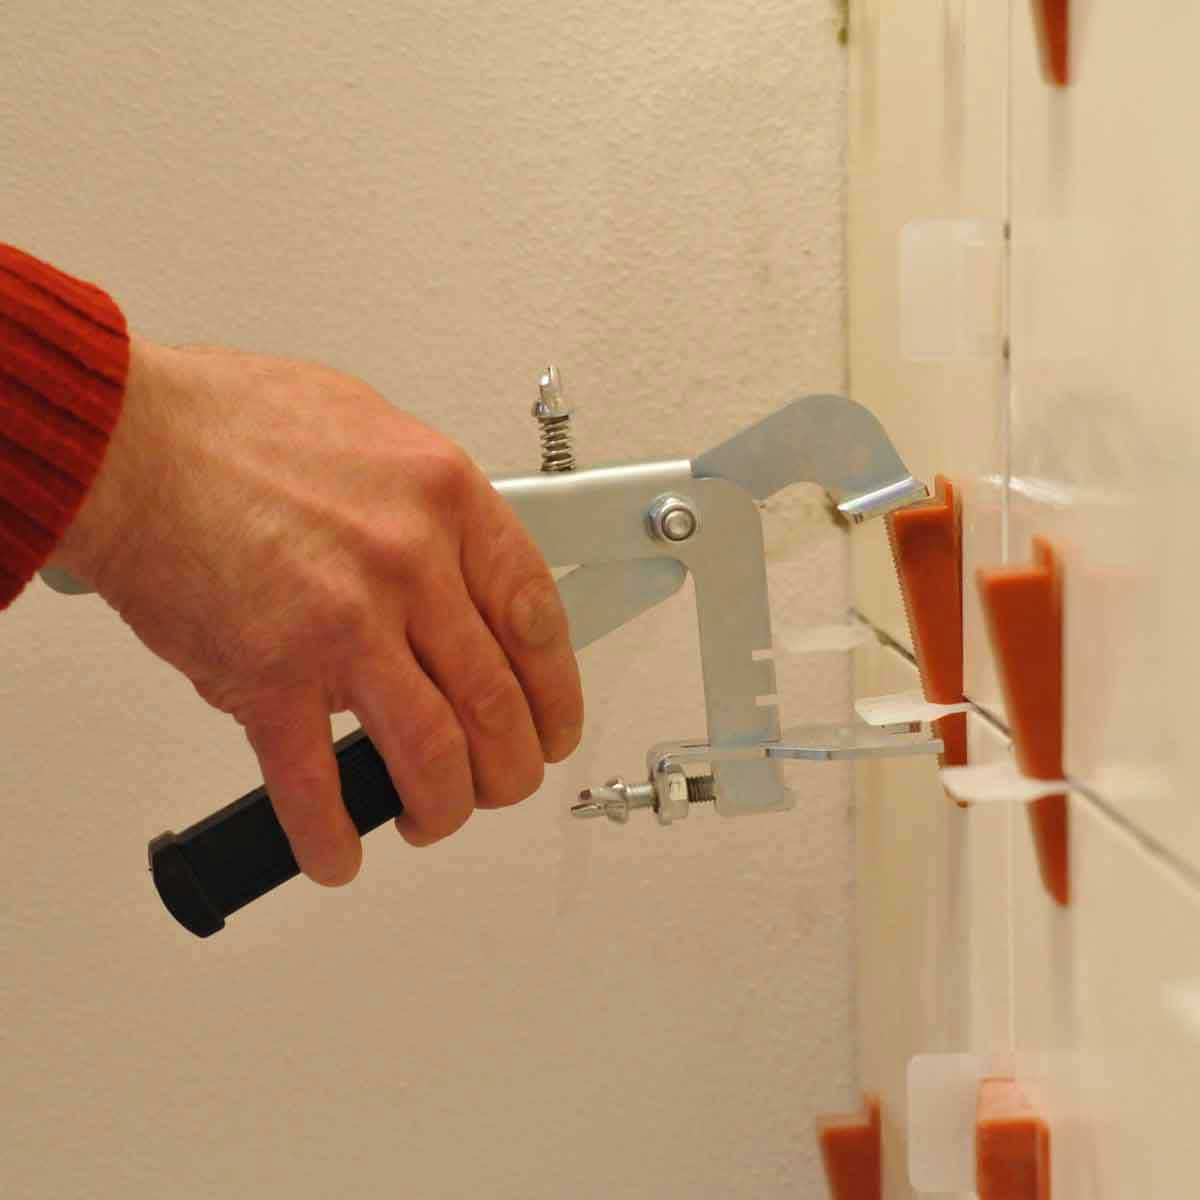 raimondi 5/32nd wall installation with pliers